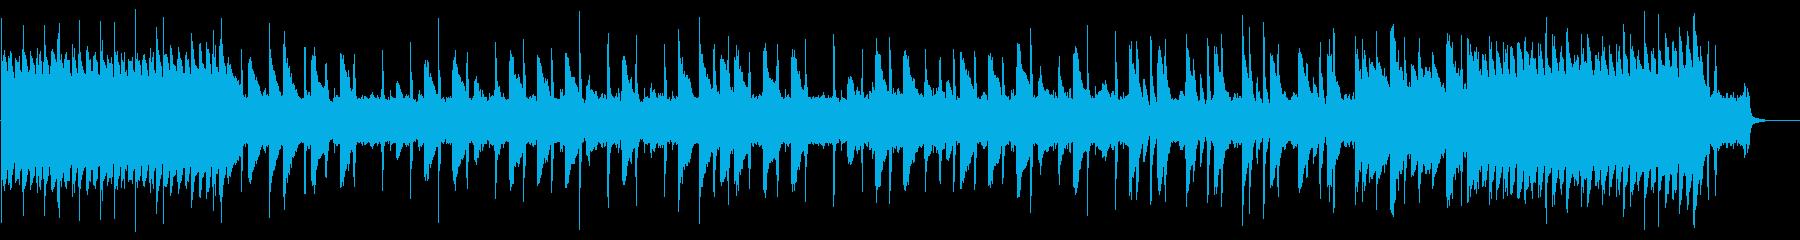 8bit 軽快なチップチューン1コーラスの再生済みの波形